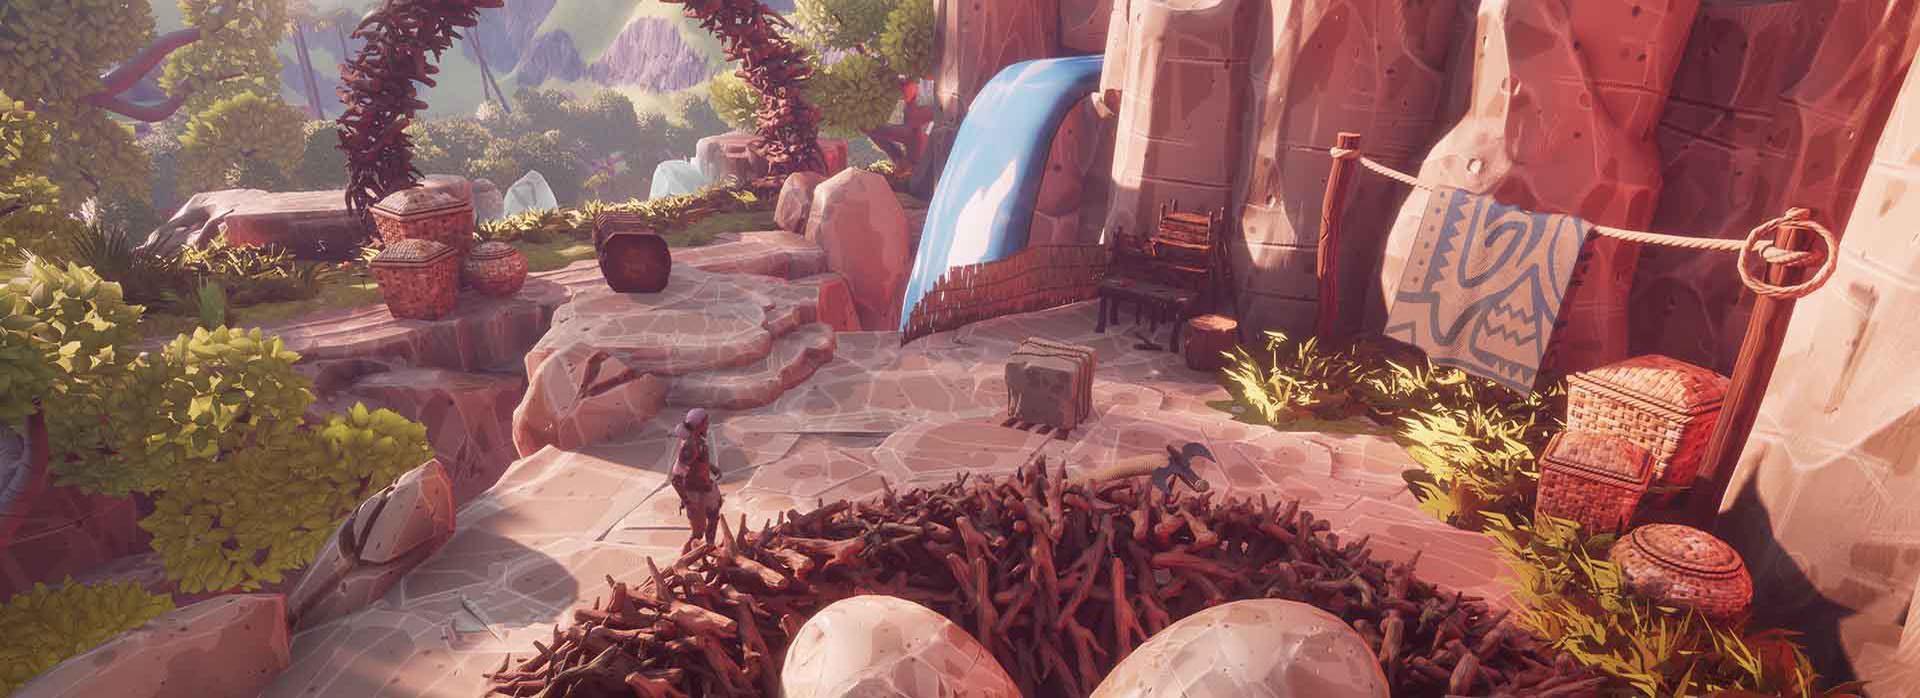 game-art-banner